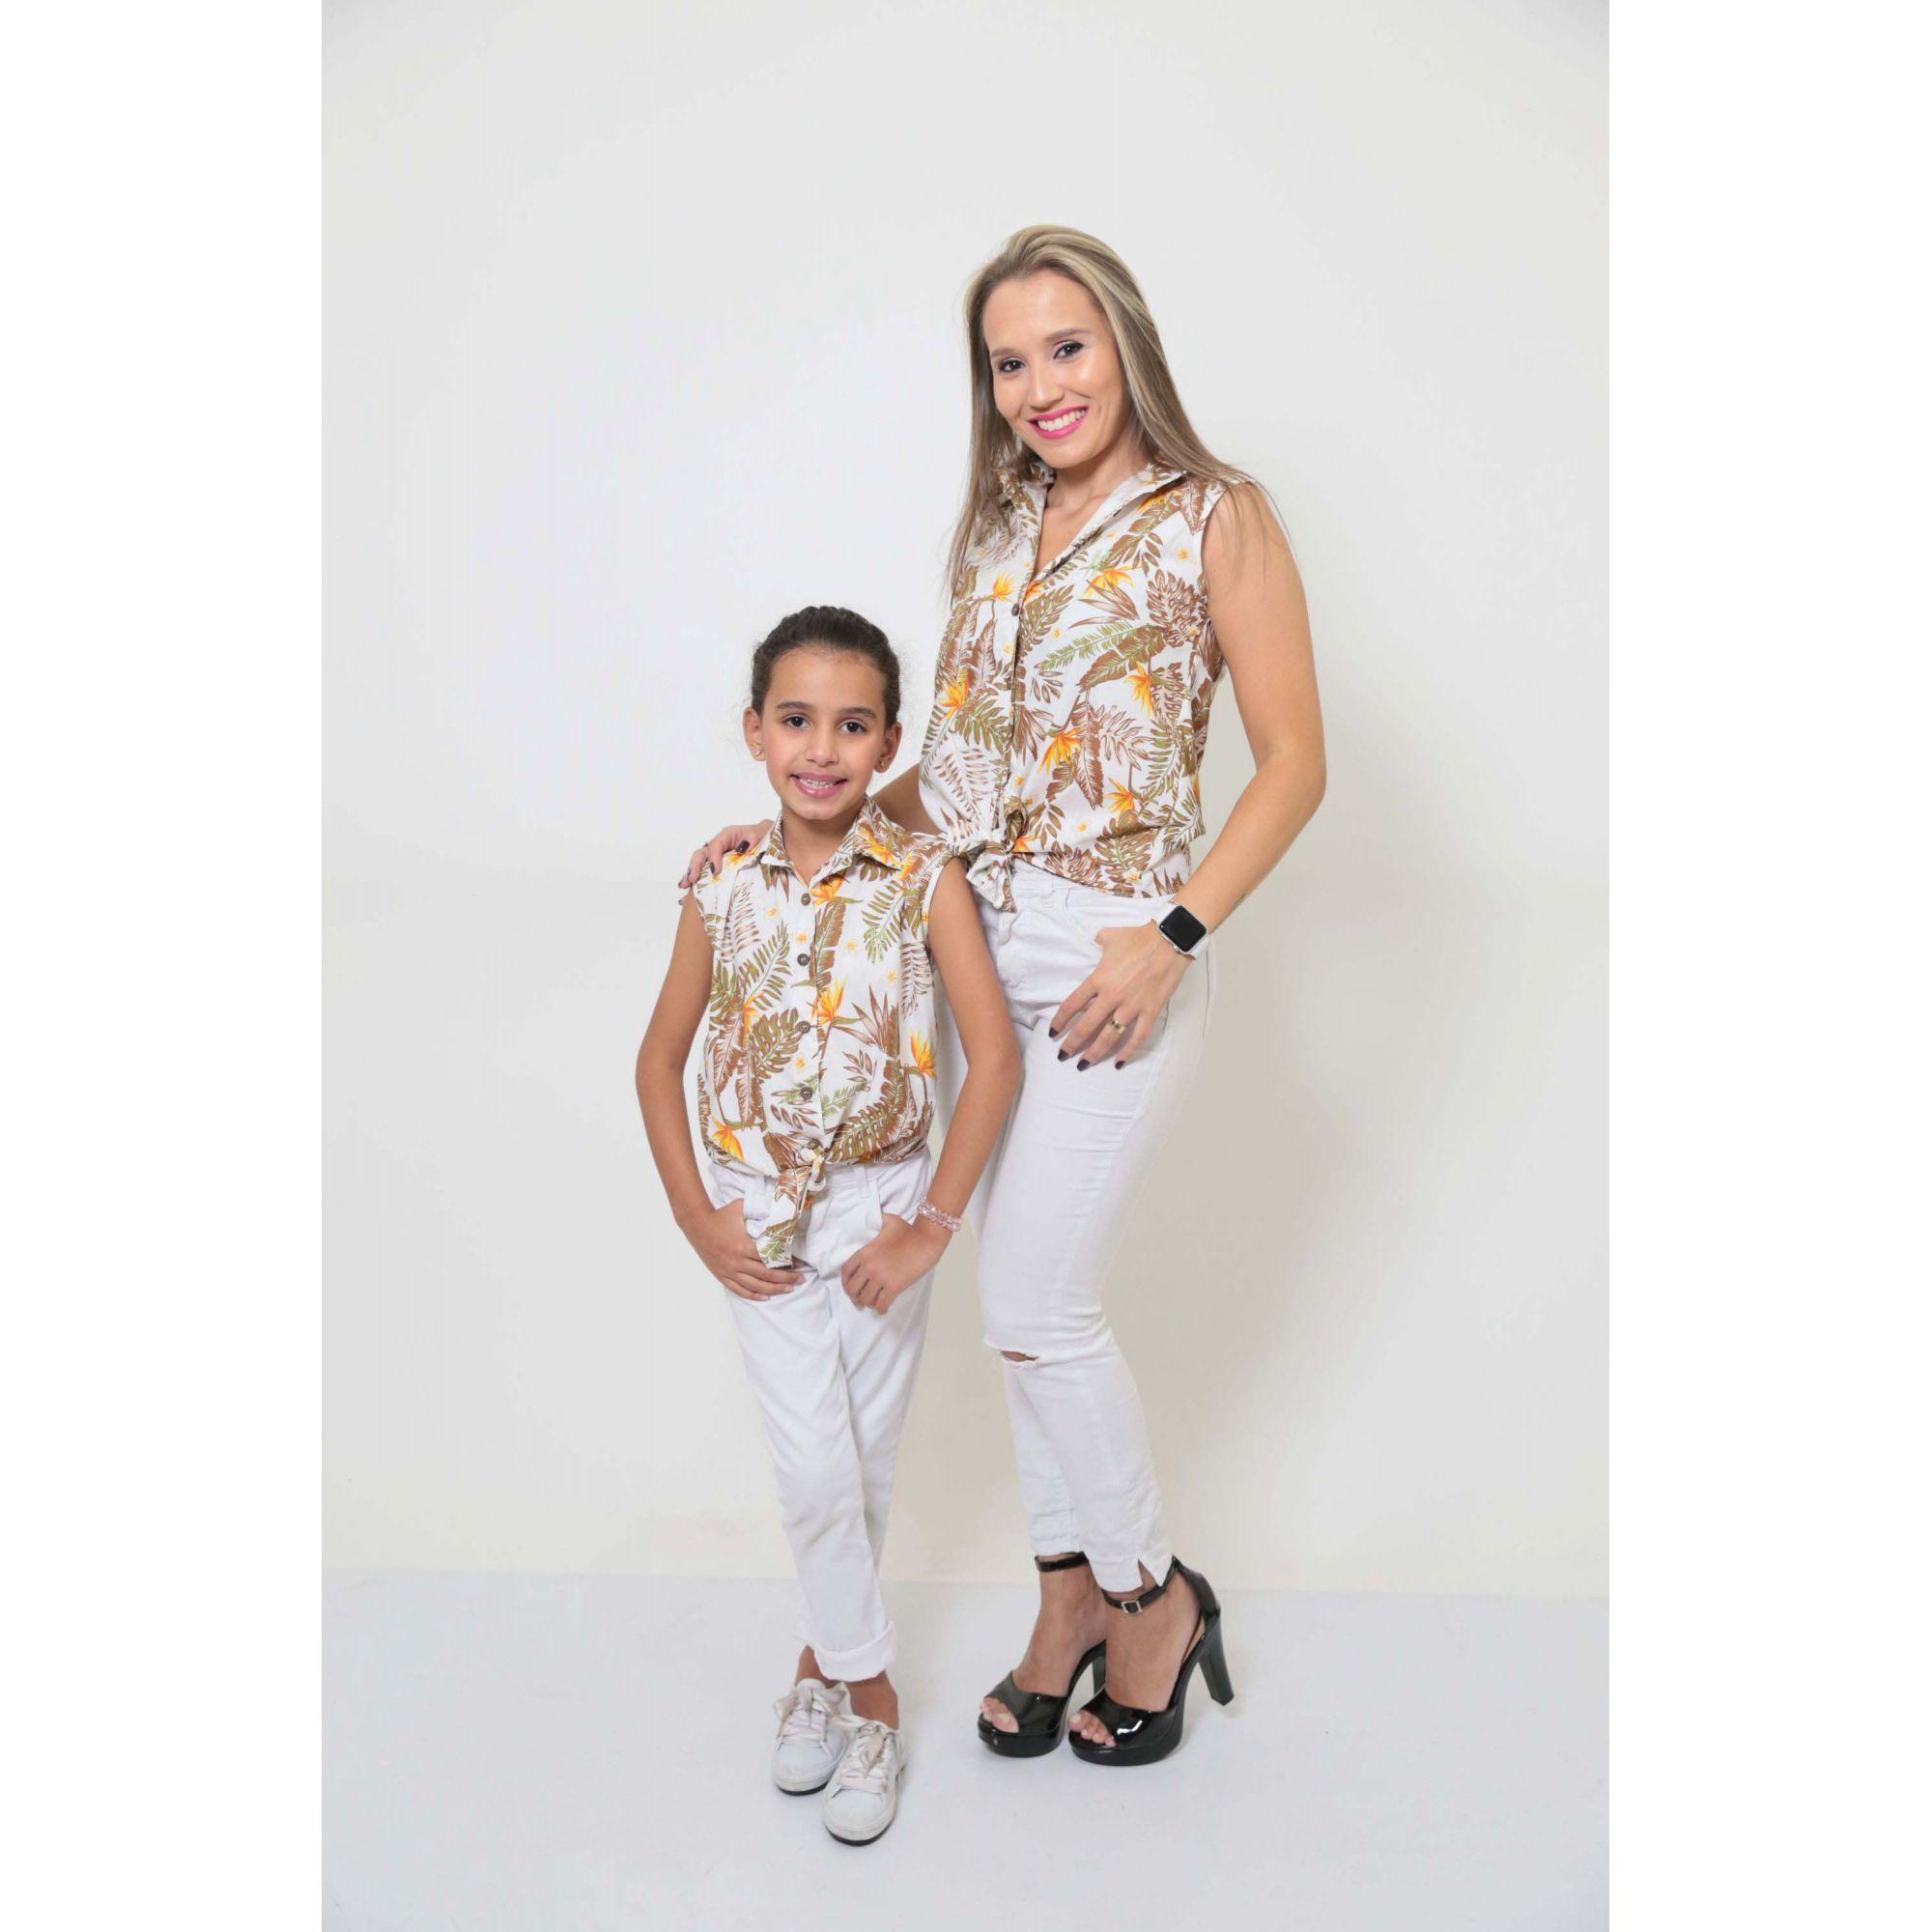 MÃE E FILHA > Kit 02 Camisas Social - Adulto e Infantil Amazonas [Coleção Tal Mãe Tal Filha]